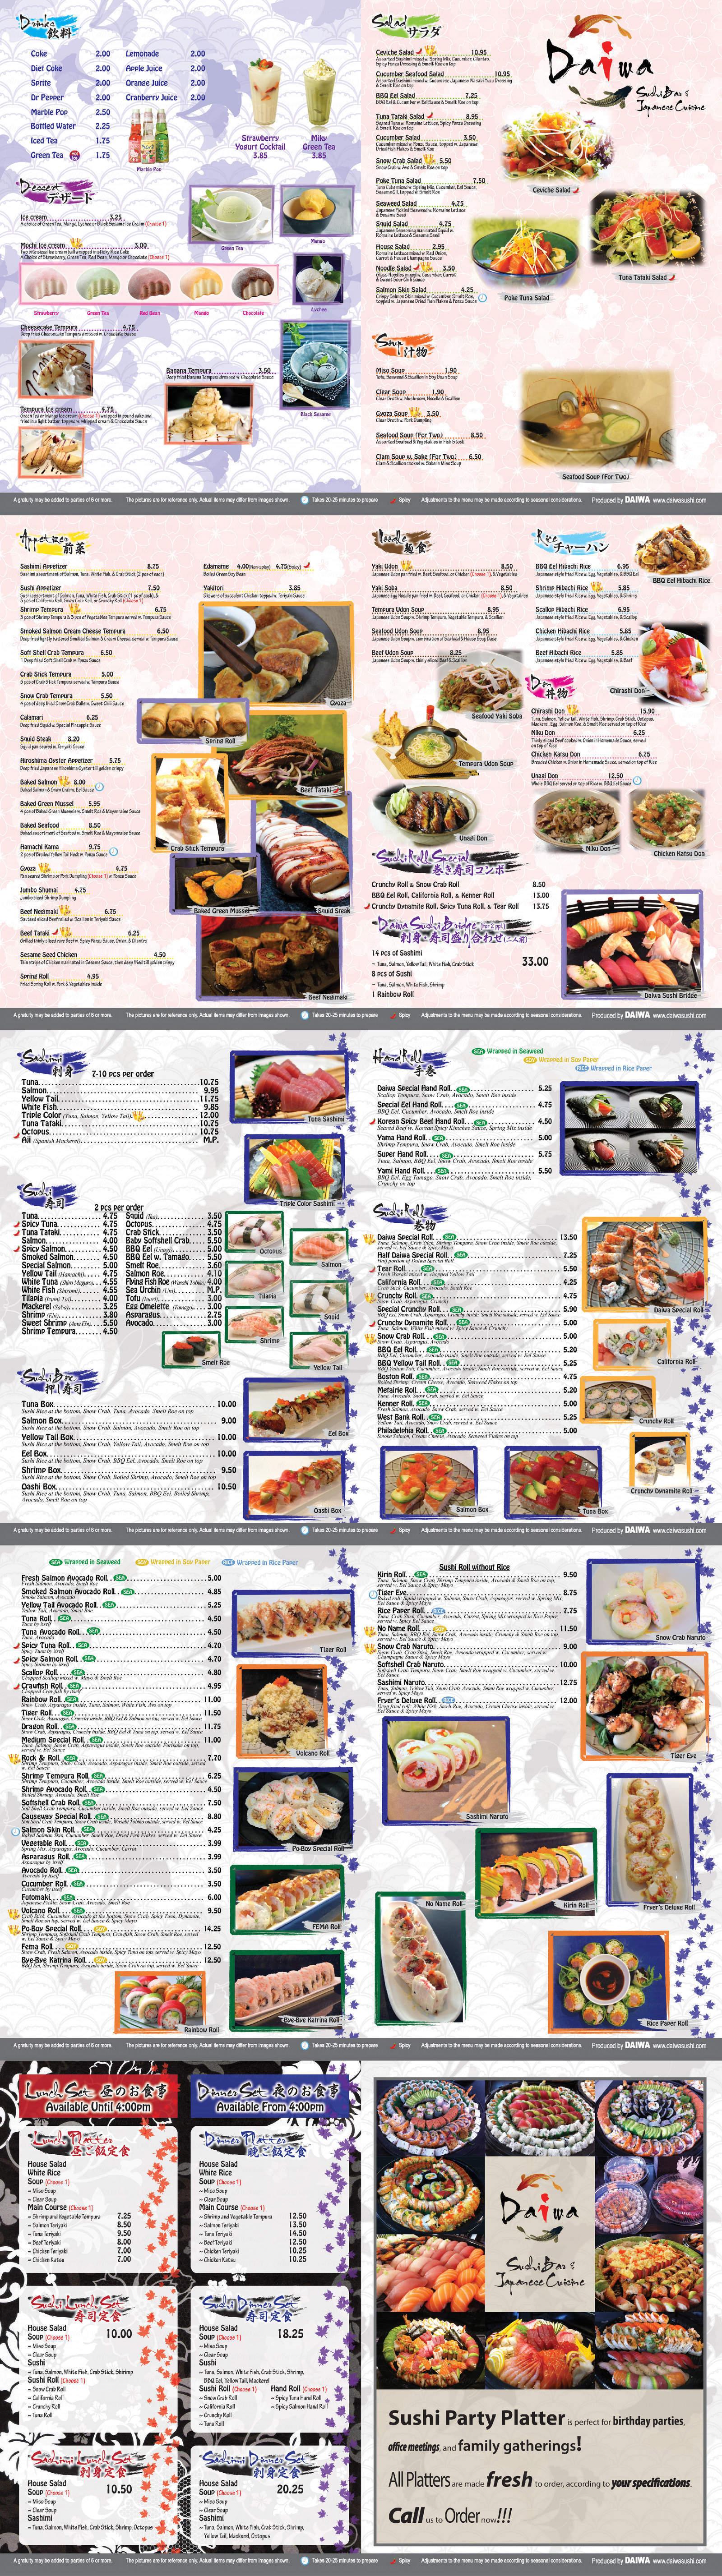 menu for Daiwa